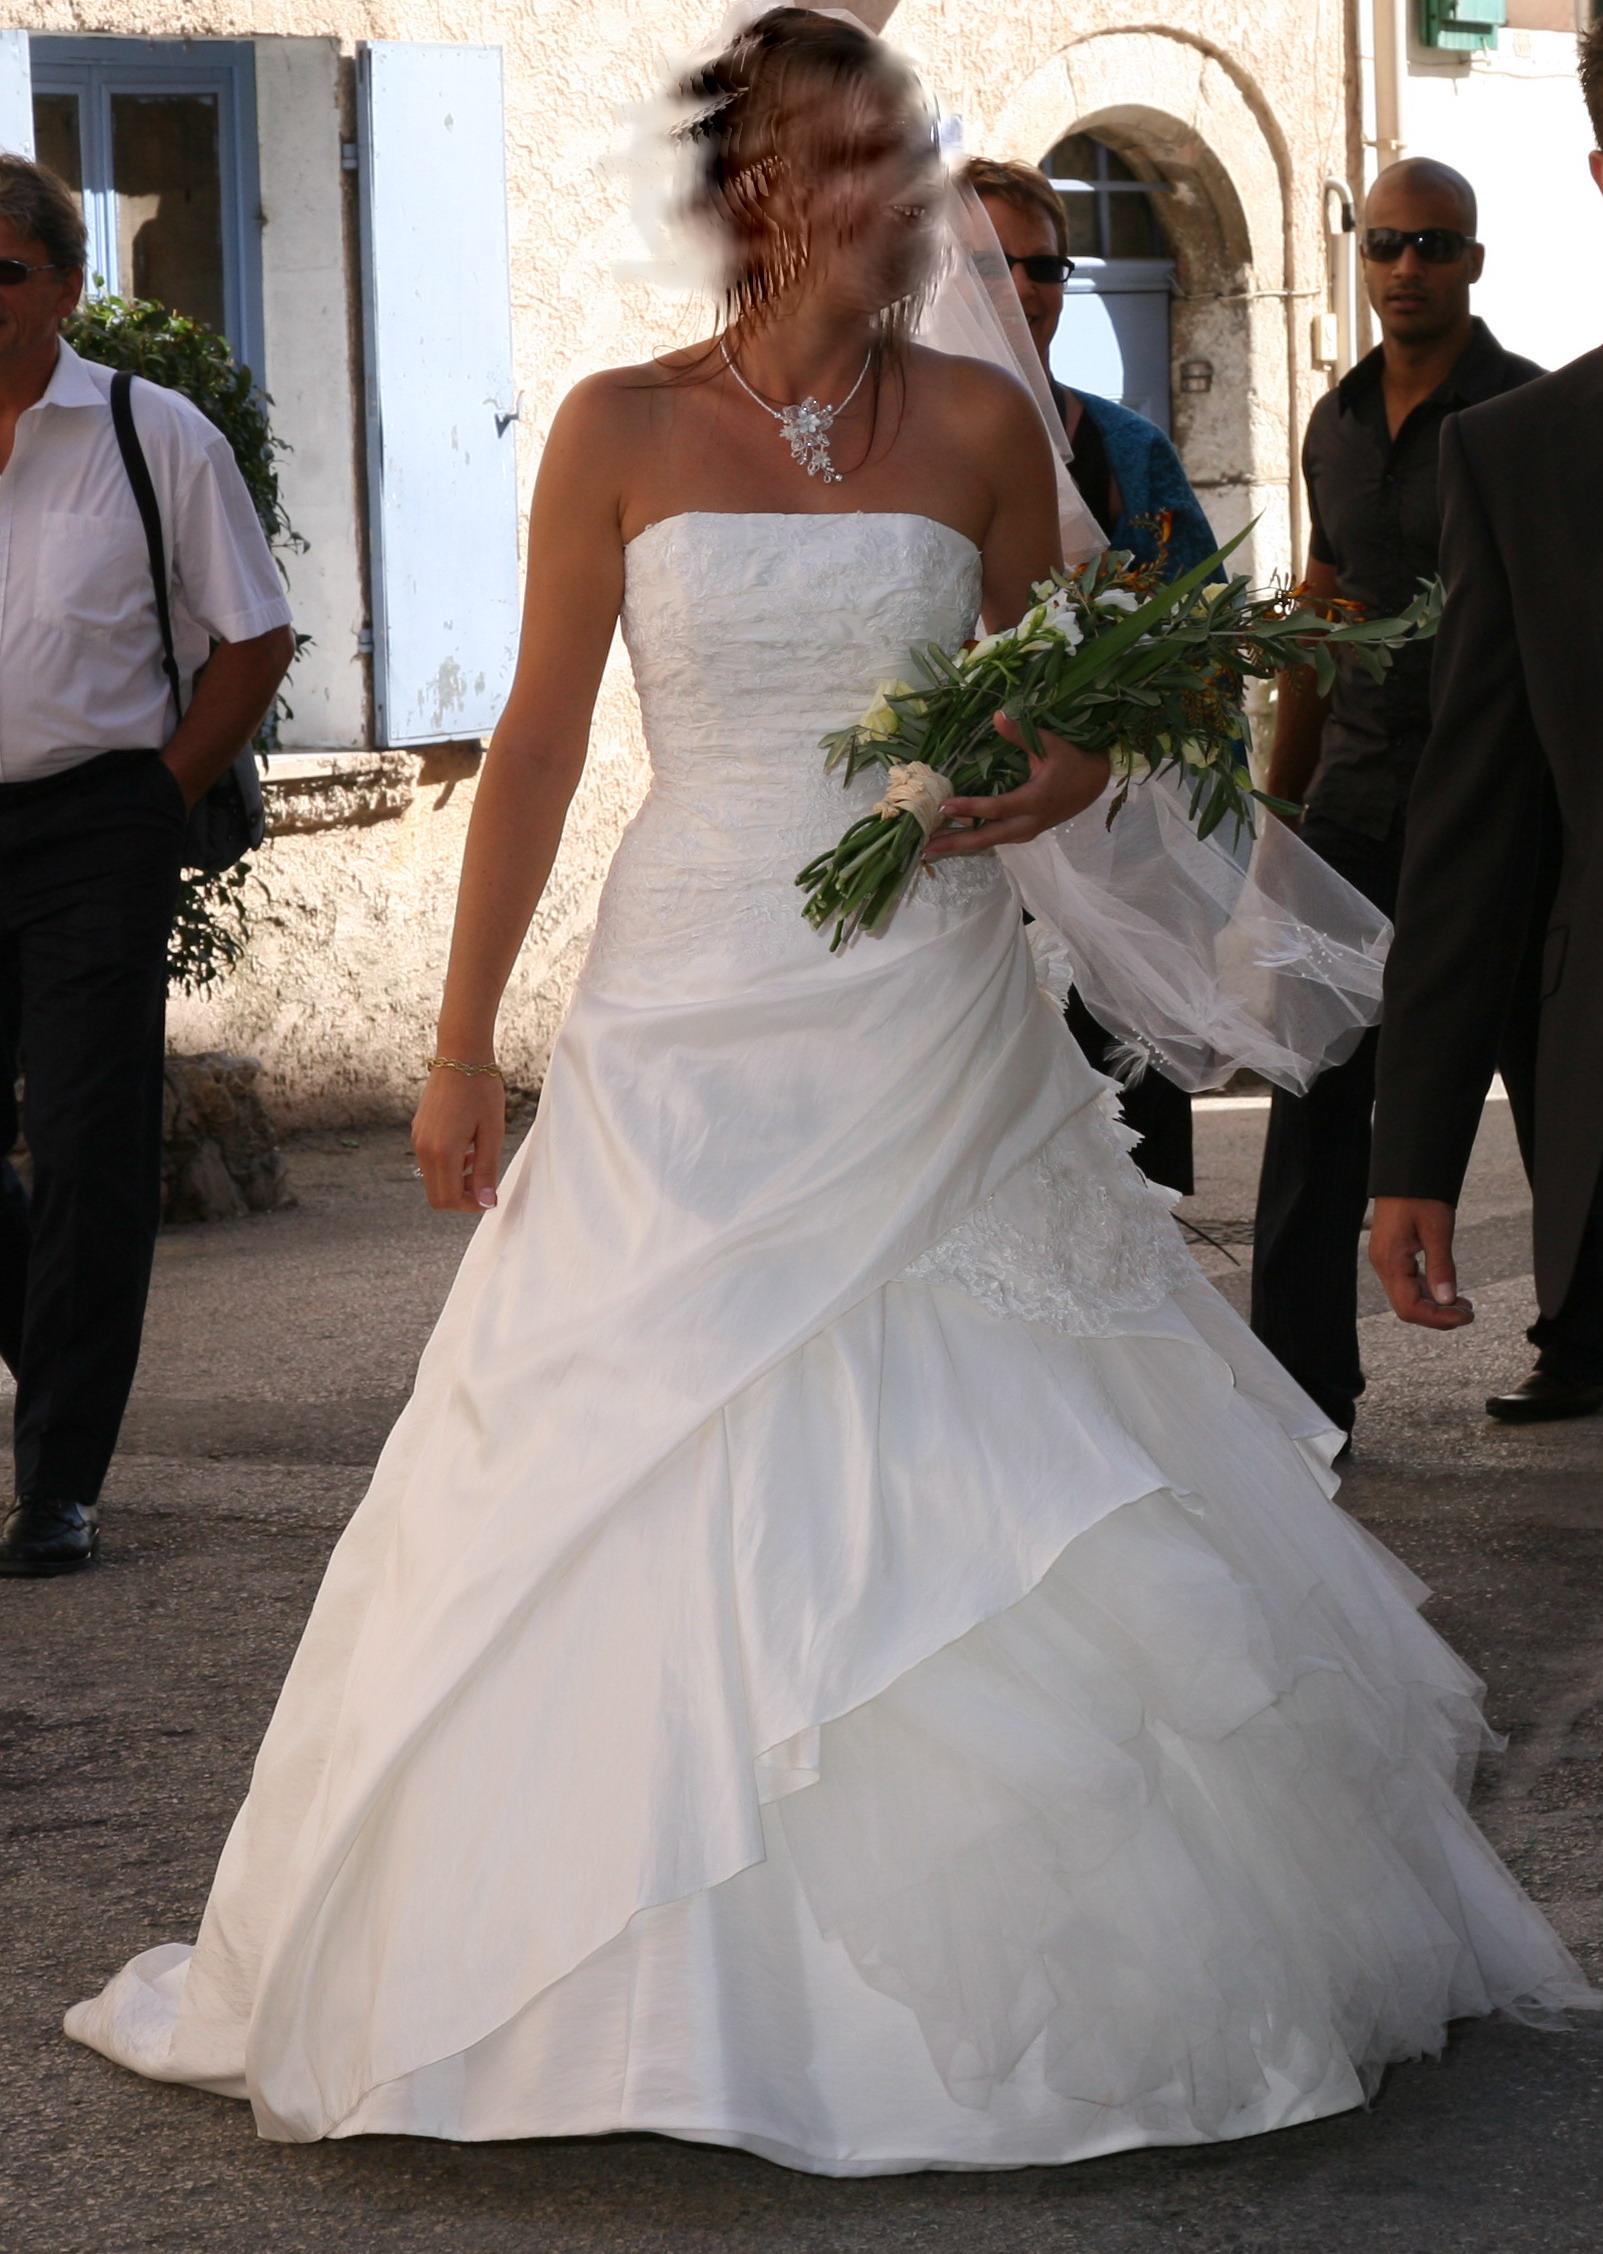 Creatrice robe de mariee toulon